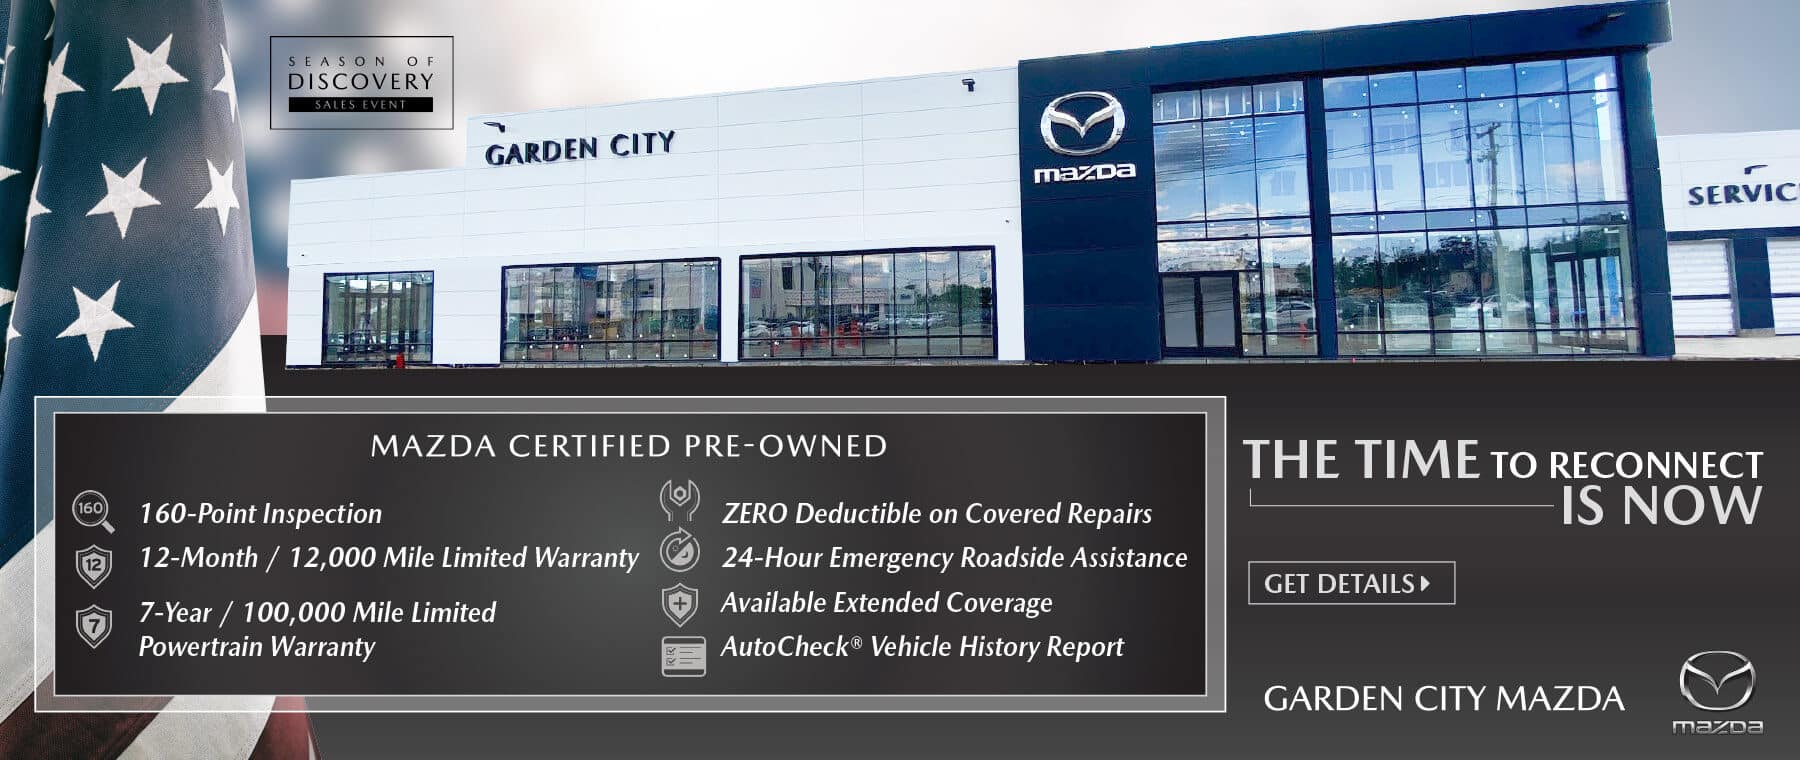 2021.06.25_Garden-City-Mazda-July-Web_S52901ll-2